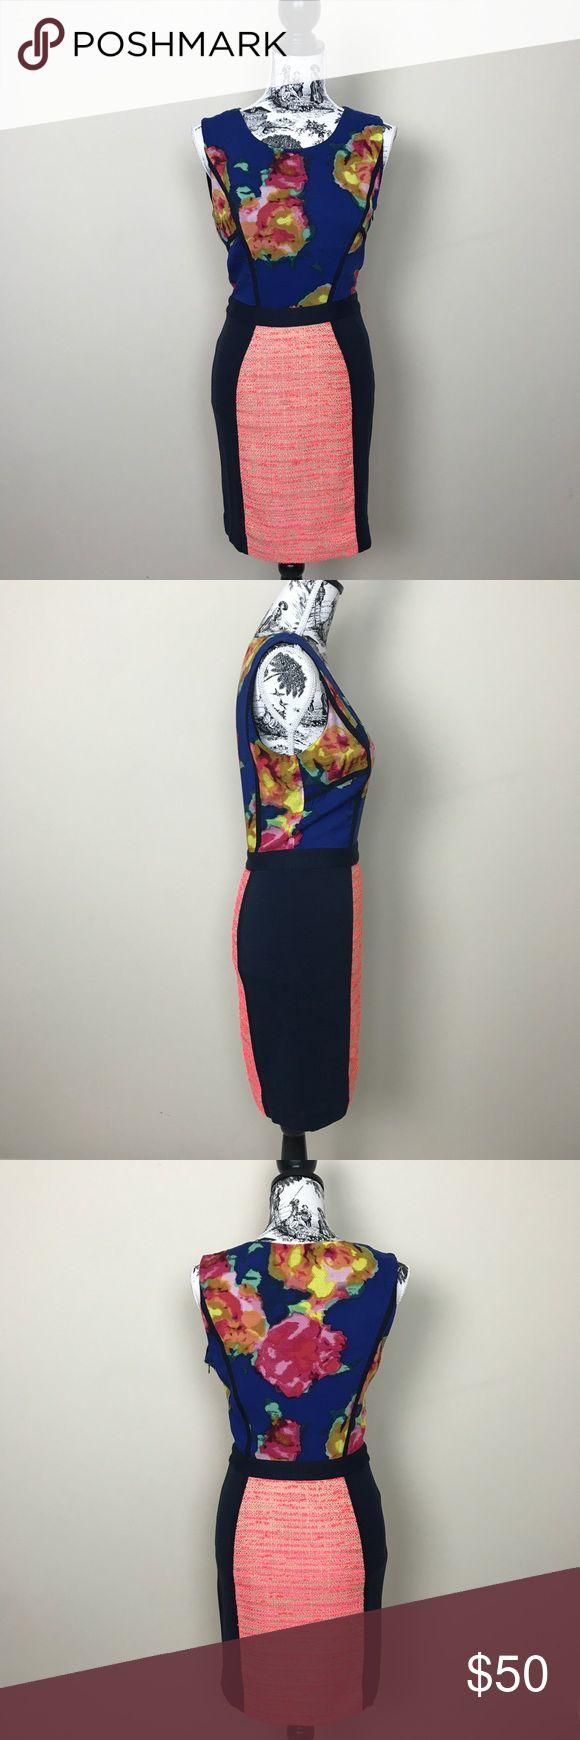 "RACHEL Rachel Roy Mixed Fabric Sheath Dress RACHEL Rachel Roy Dress with mixed fabric. Upper floral print with neon skirt. Side concealed zipper. Upper 100% viscose lower 60% polyester, 40% acrylic. Length measures 35.5"", bust 17"", waist 13"". RACHEL Rachel Roy Dresses Mini"